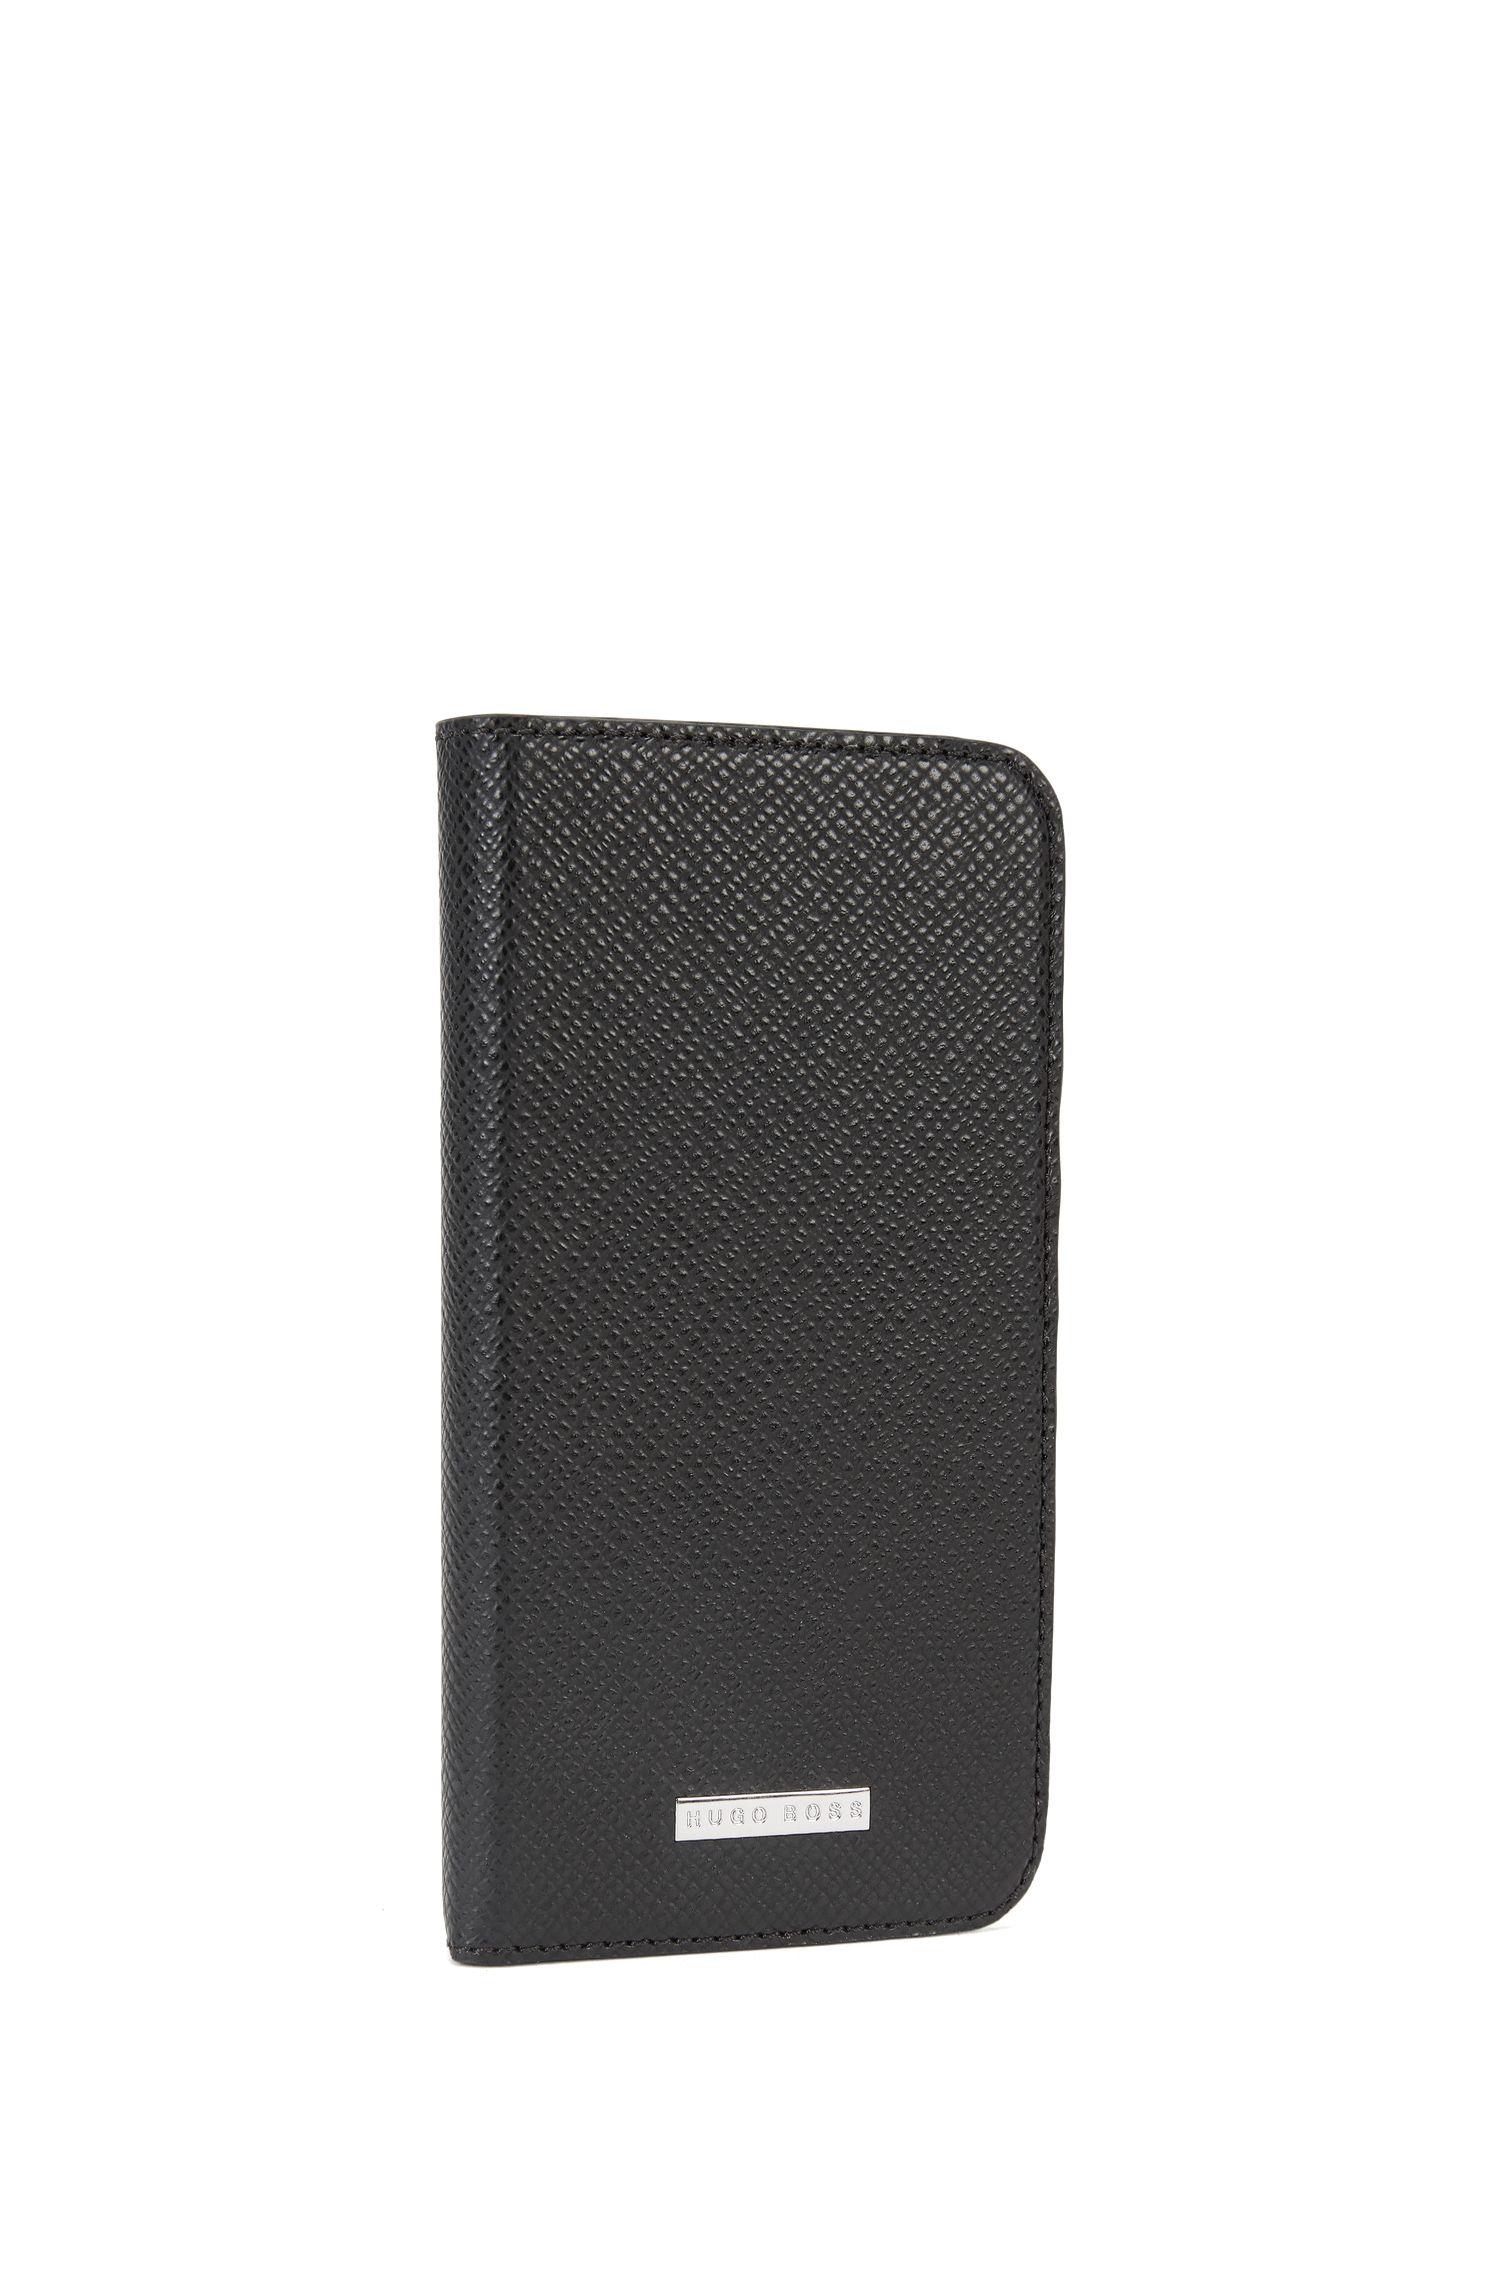 'Signature Phone Flap' | Calfskin Embossed iPhone 7 Phone Case